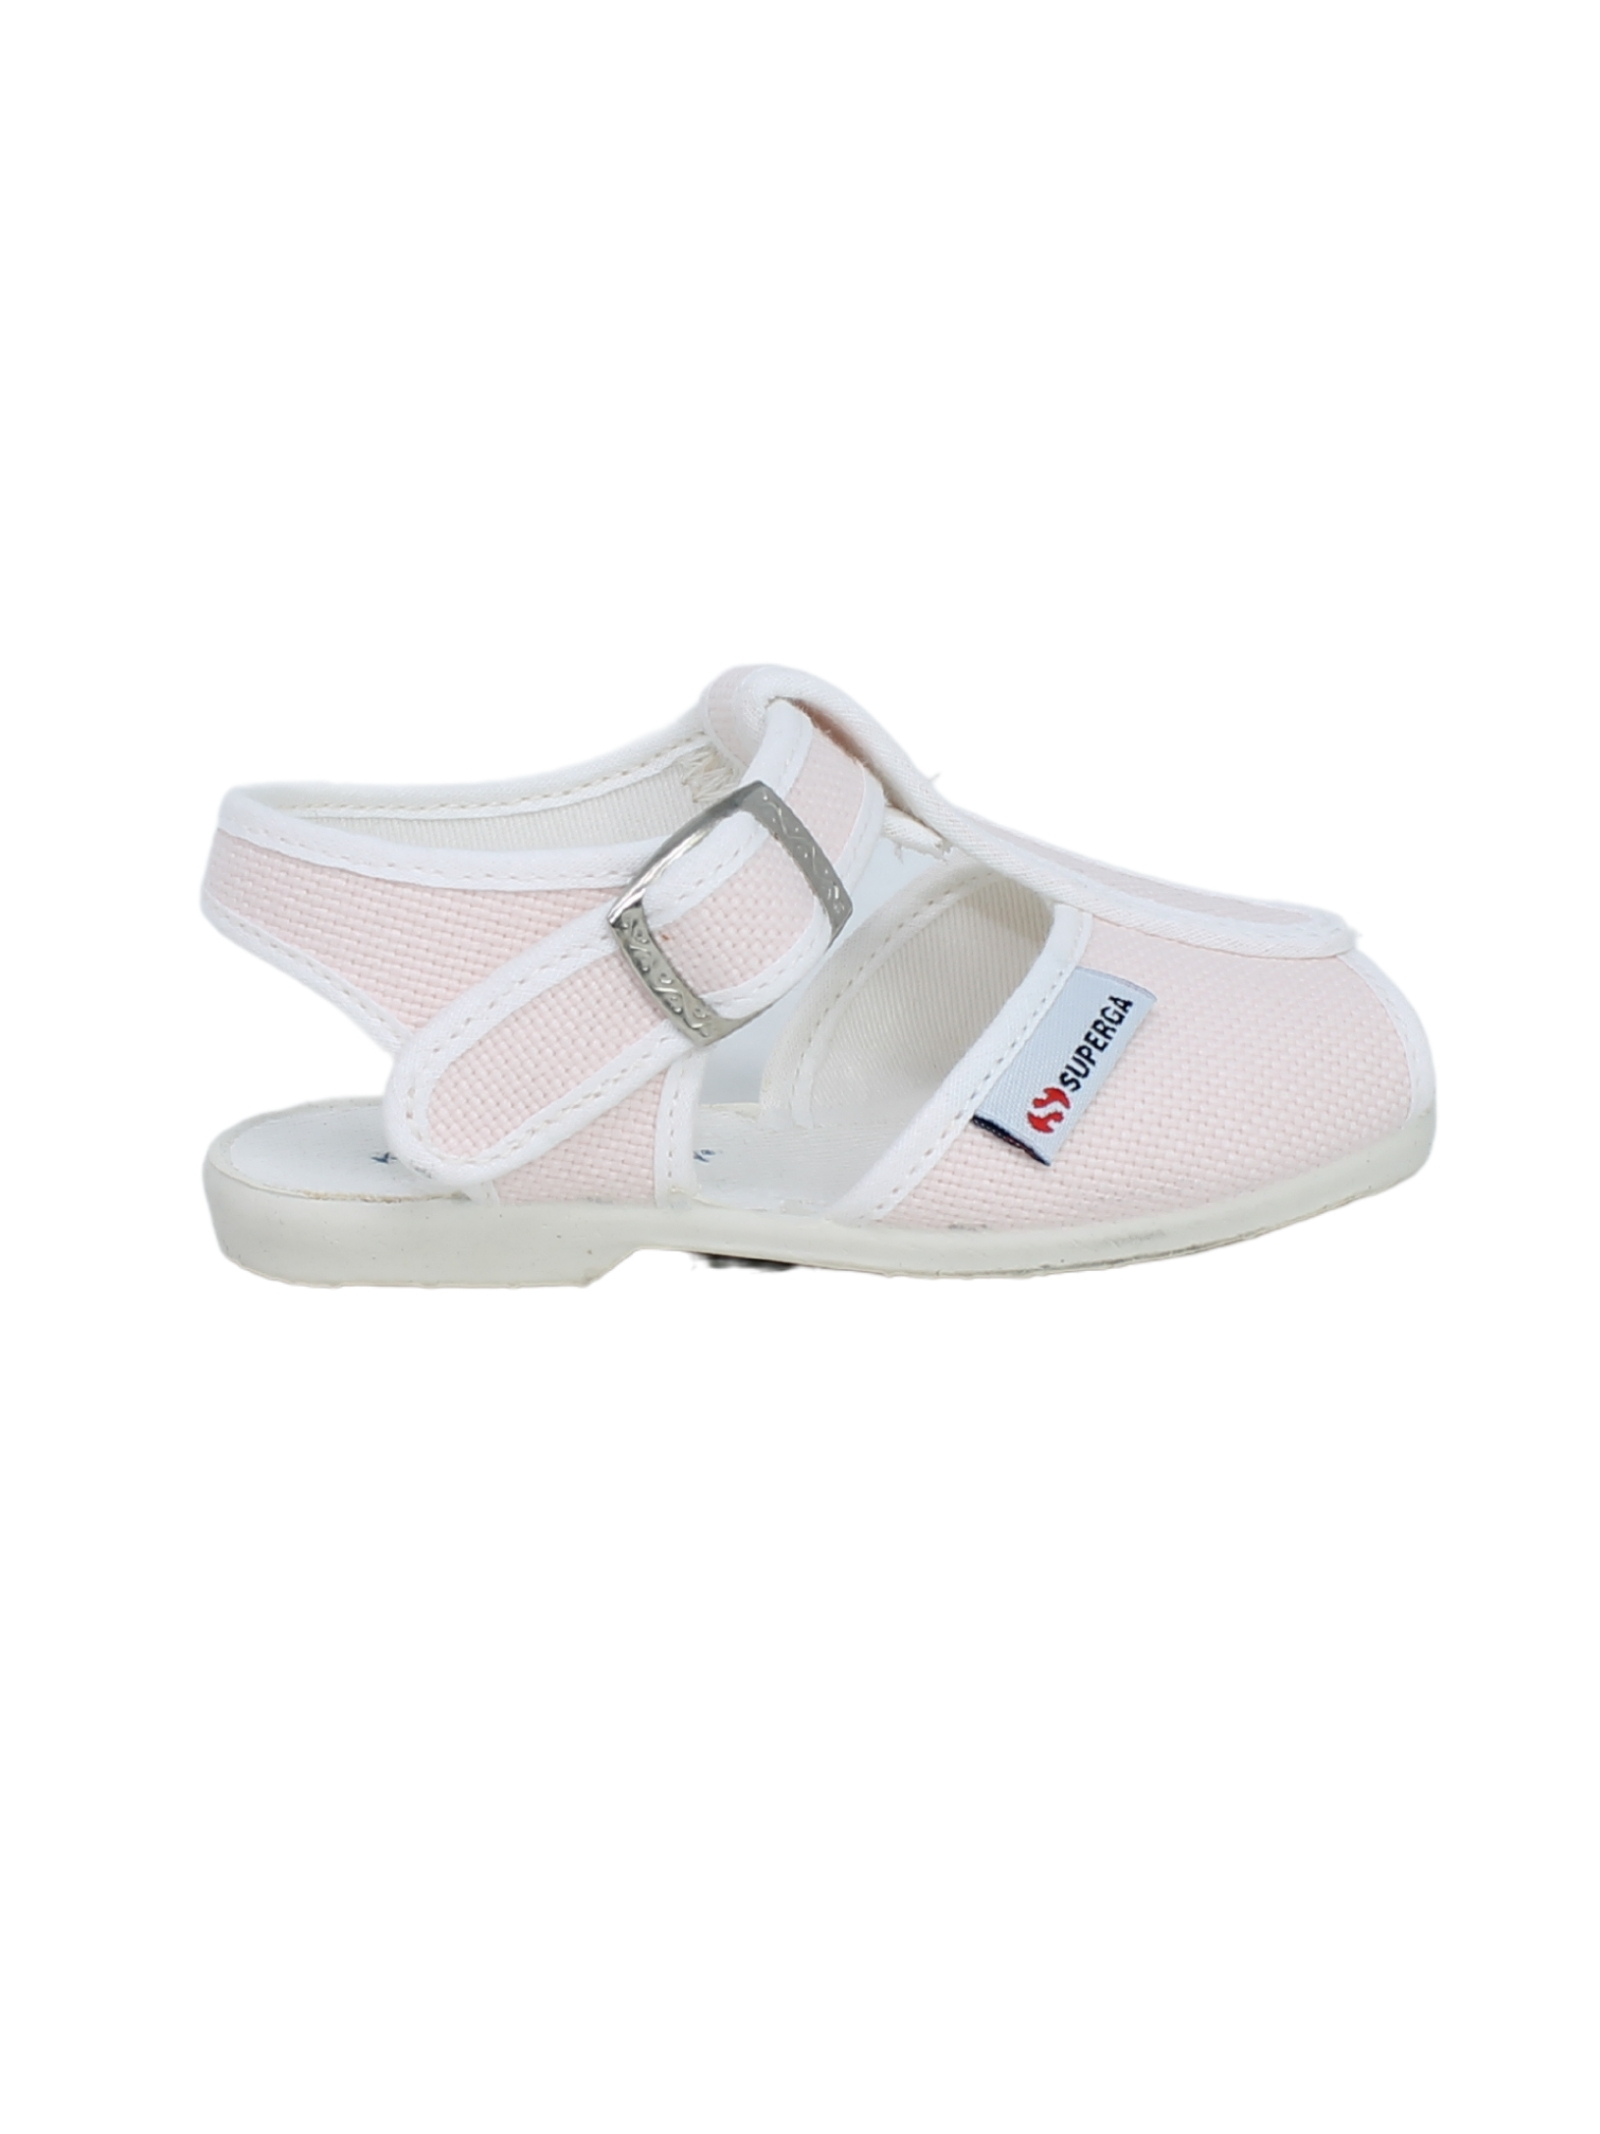 SUPERGA KIDS | Sandals | 1200S0026A0Q